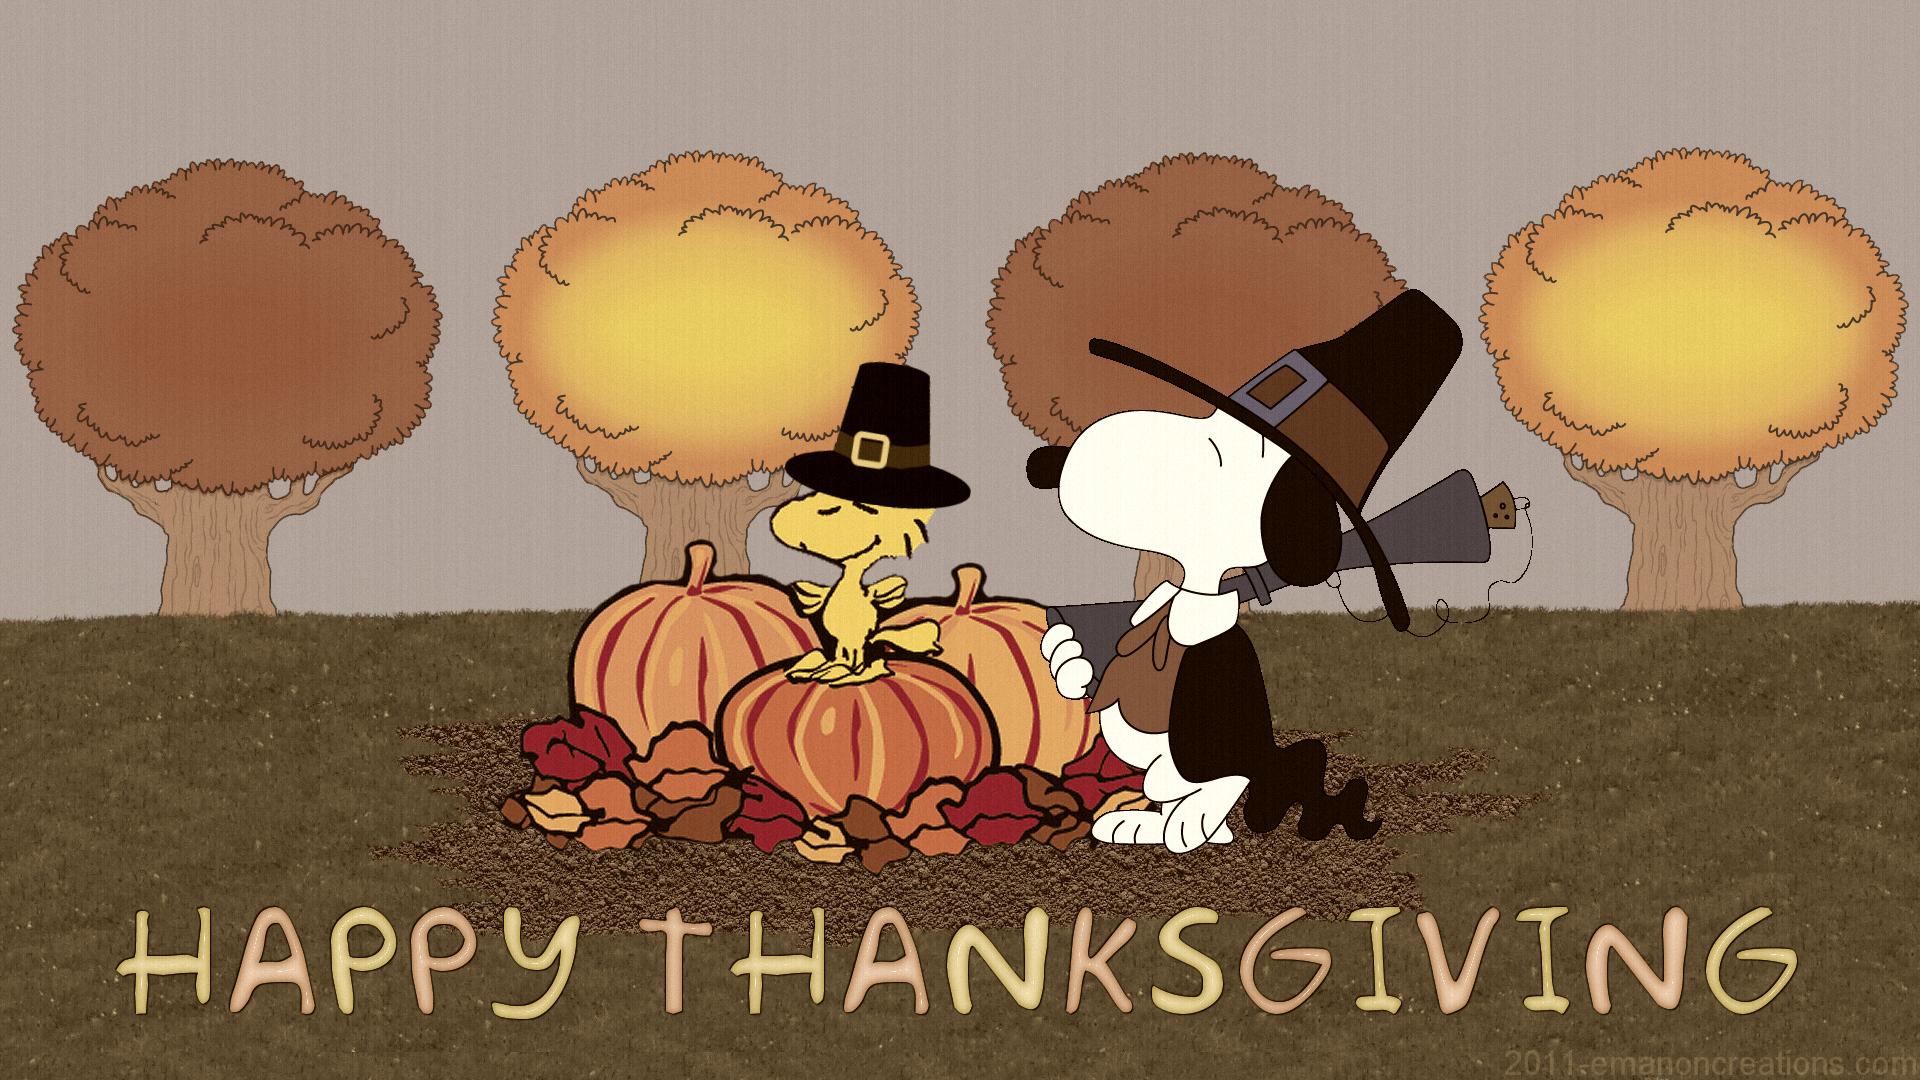 Snoopy Thanksgiving High Quality HD Wallpaper Desktop 1920x1080